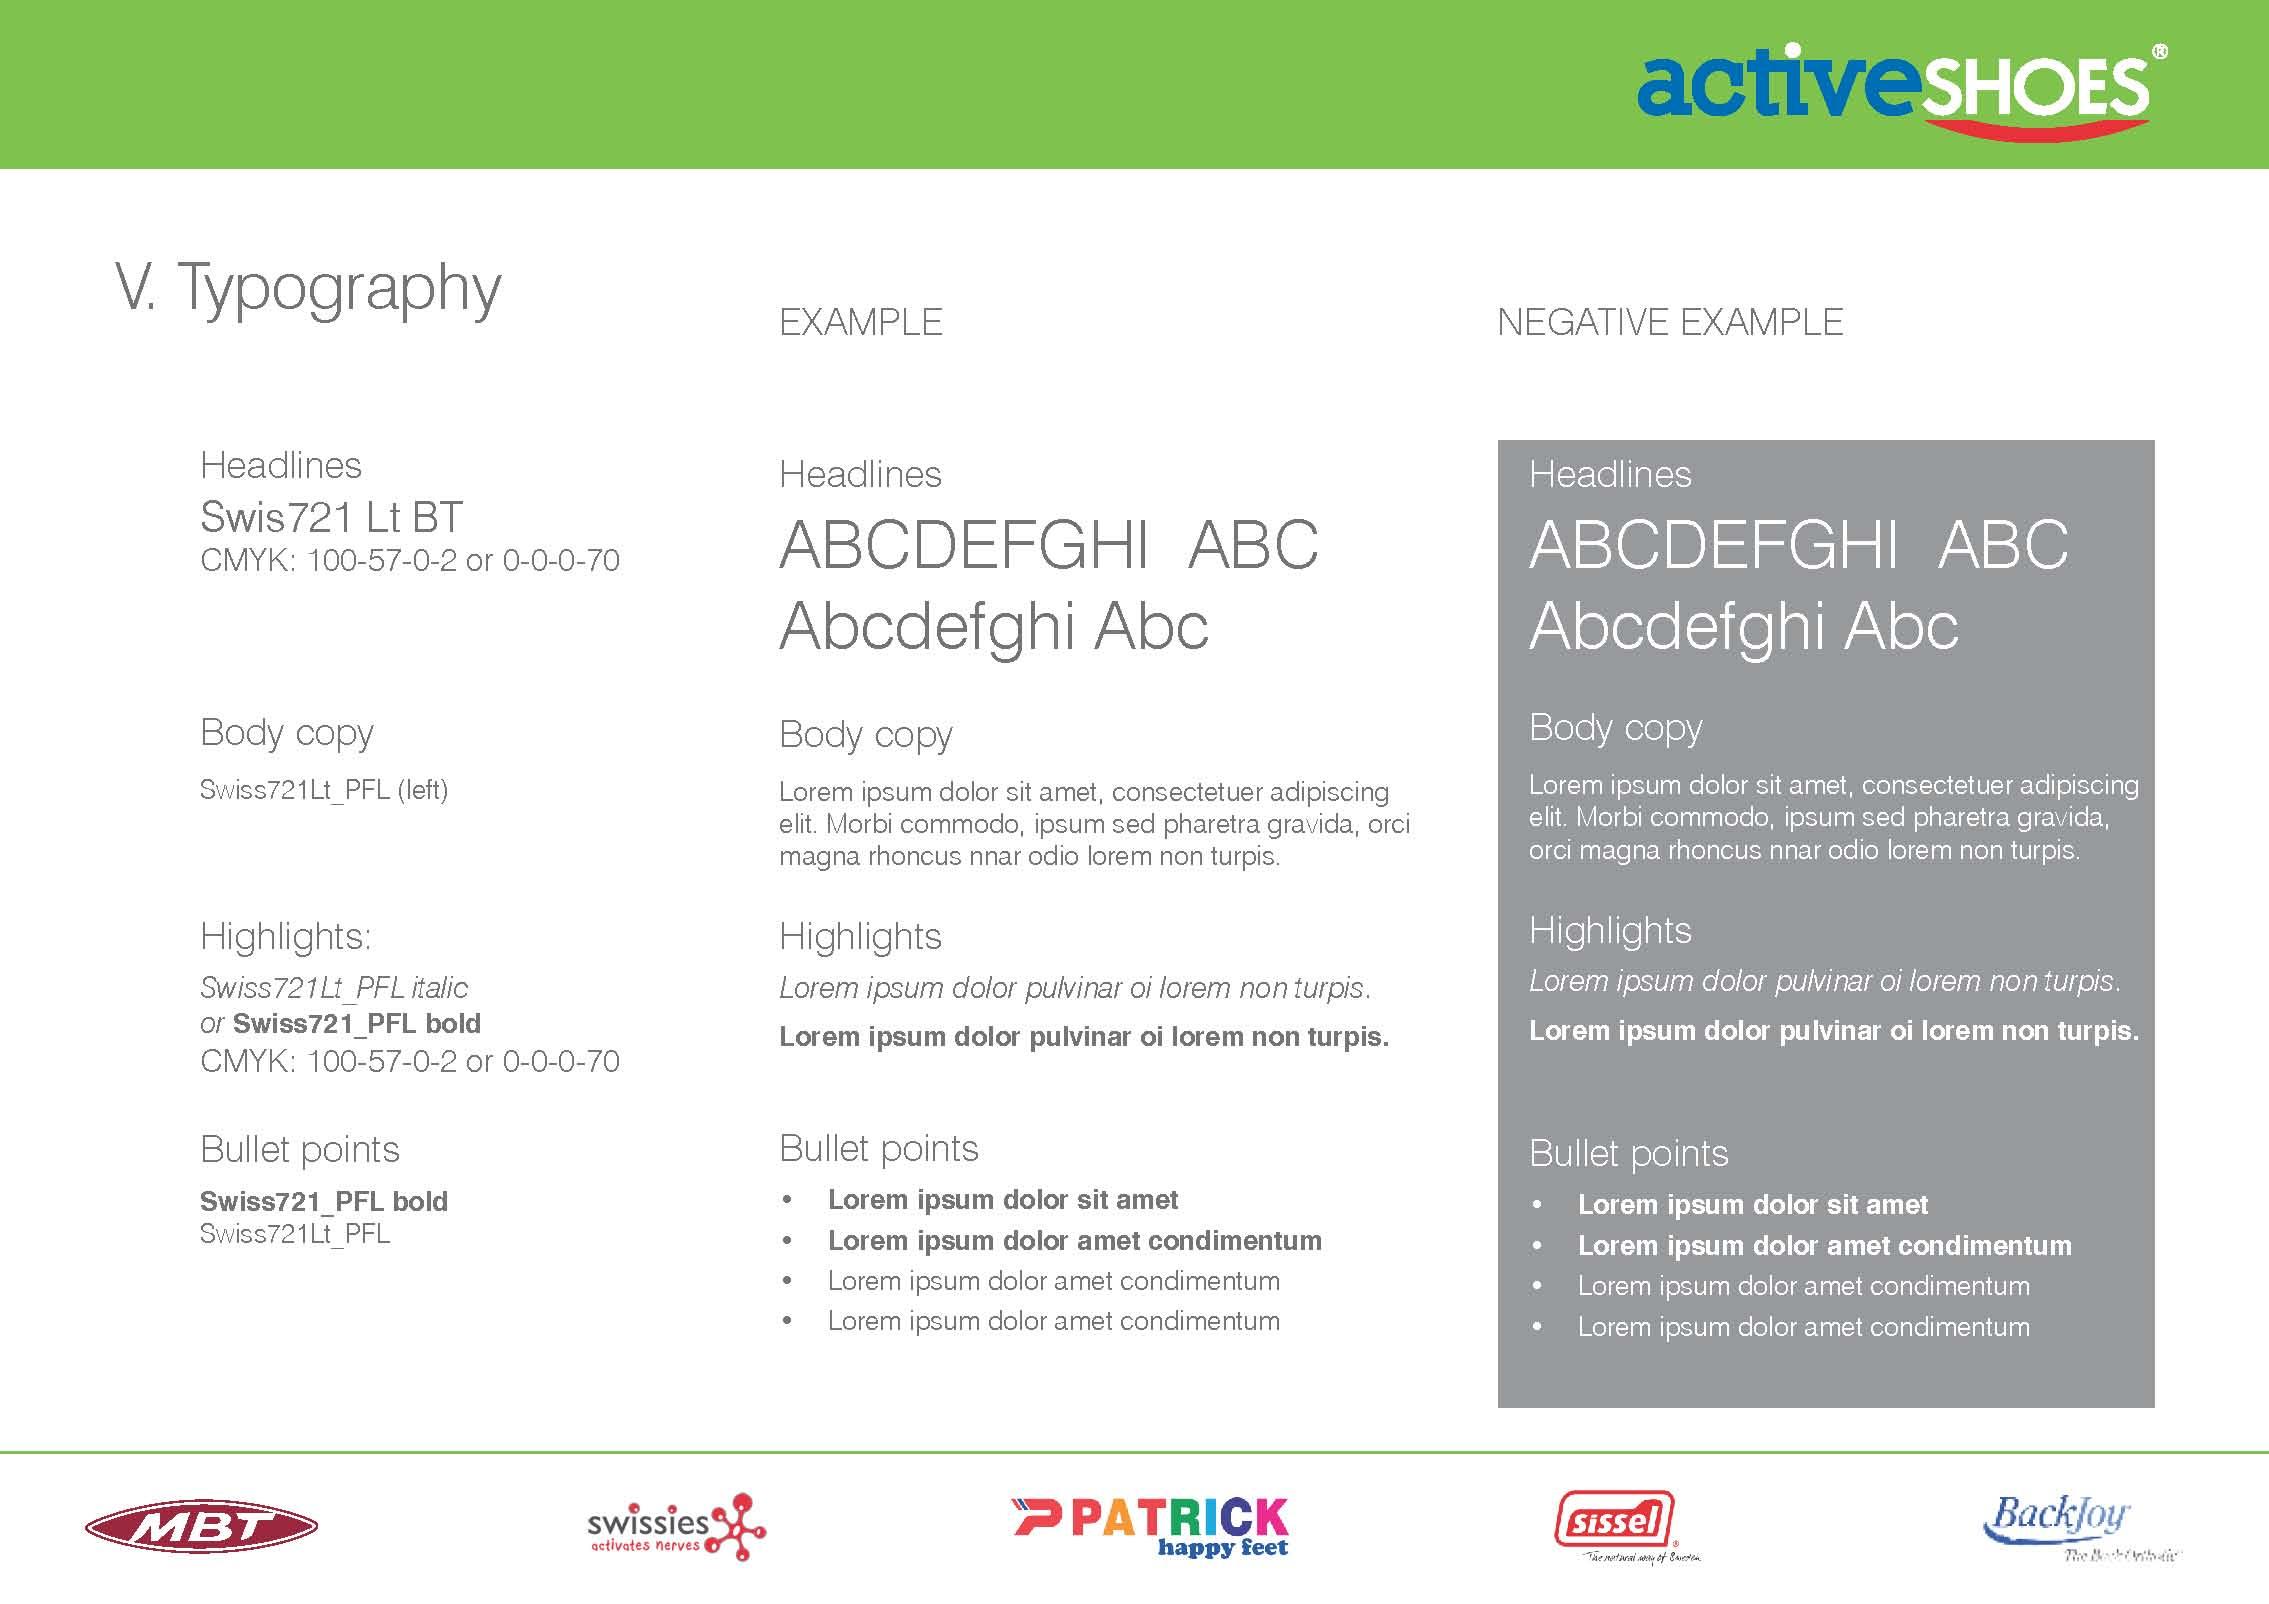 activeshoes_designbook_2011_07_A4-es_4_Page_07